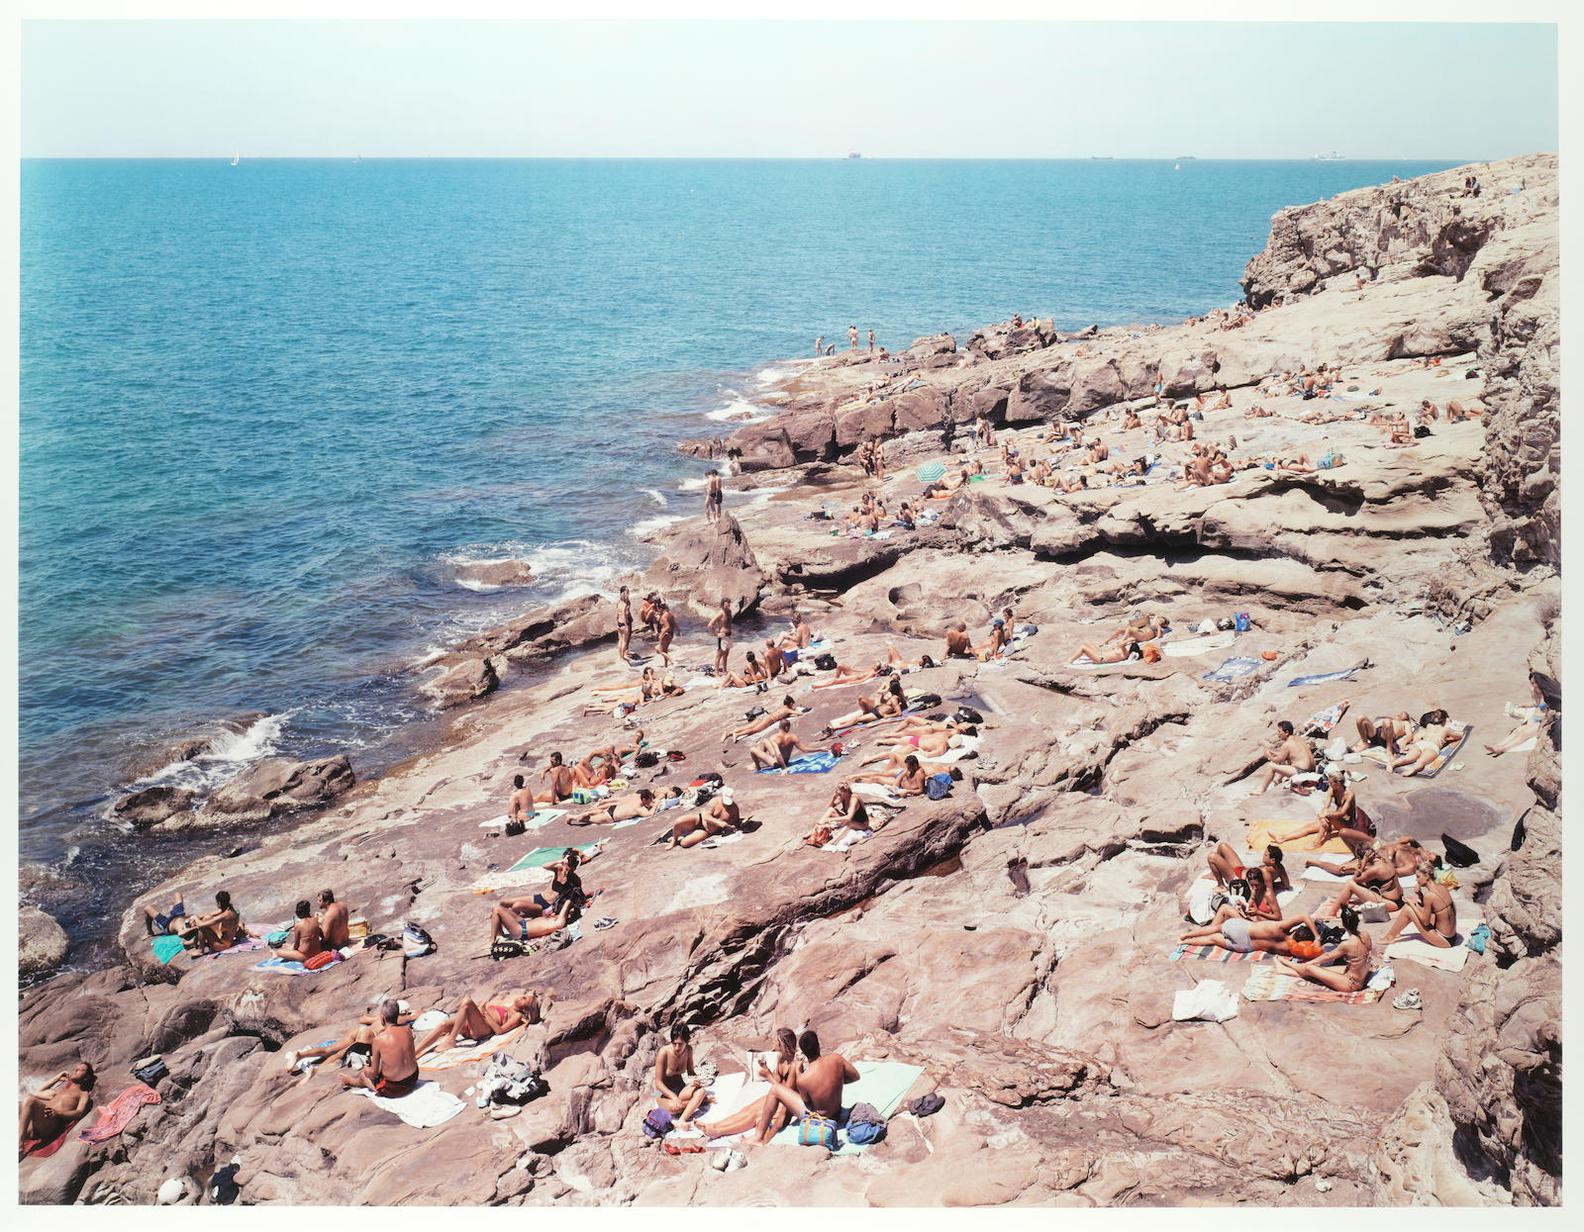 Massimo Vitali-Calafuria, From Portfolio Of Landscapes And Figures-2006